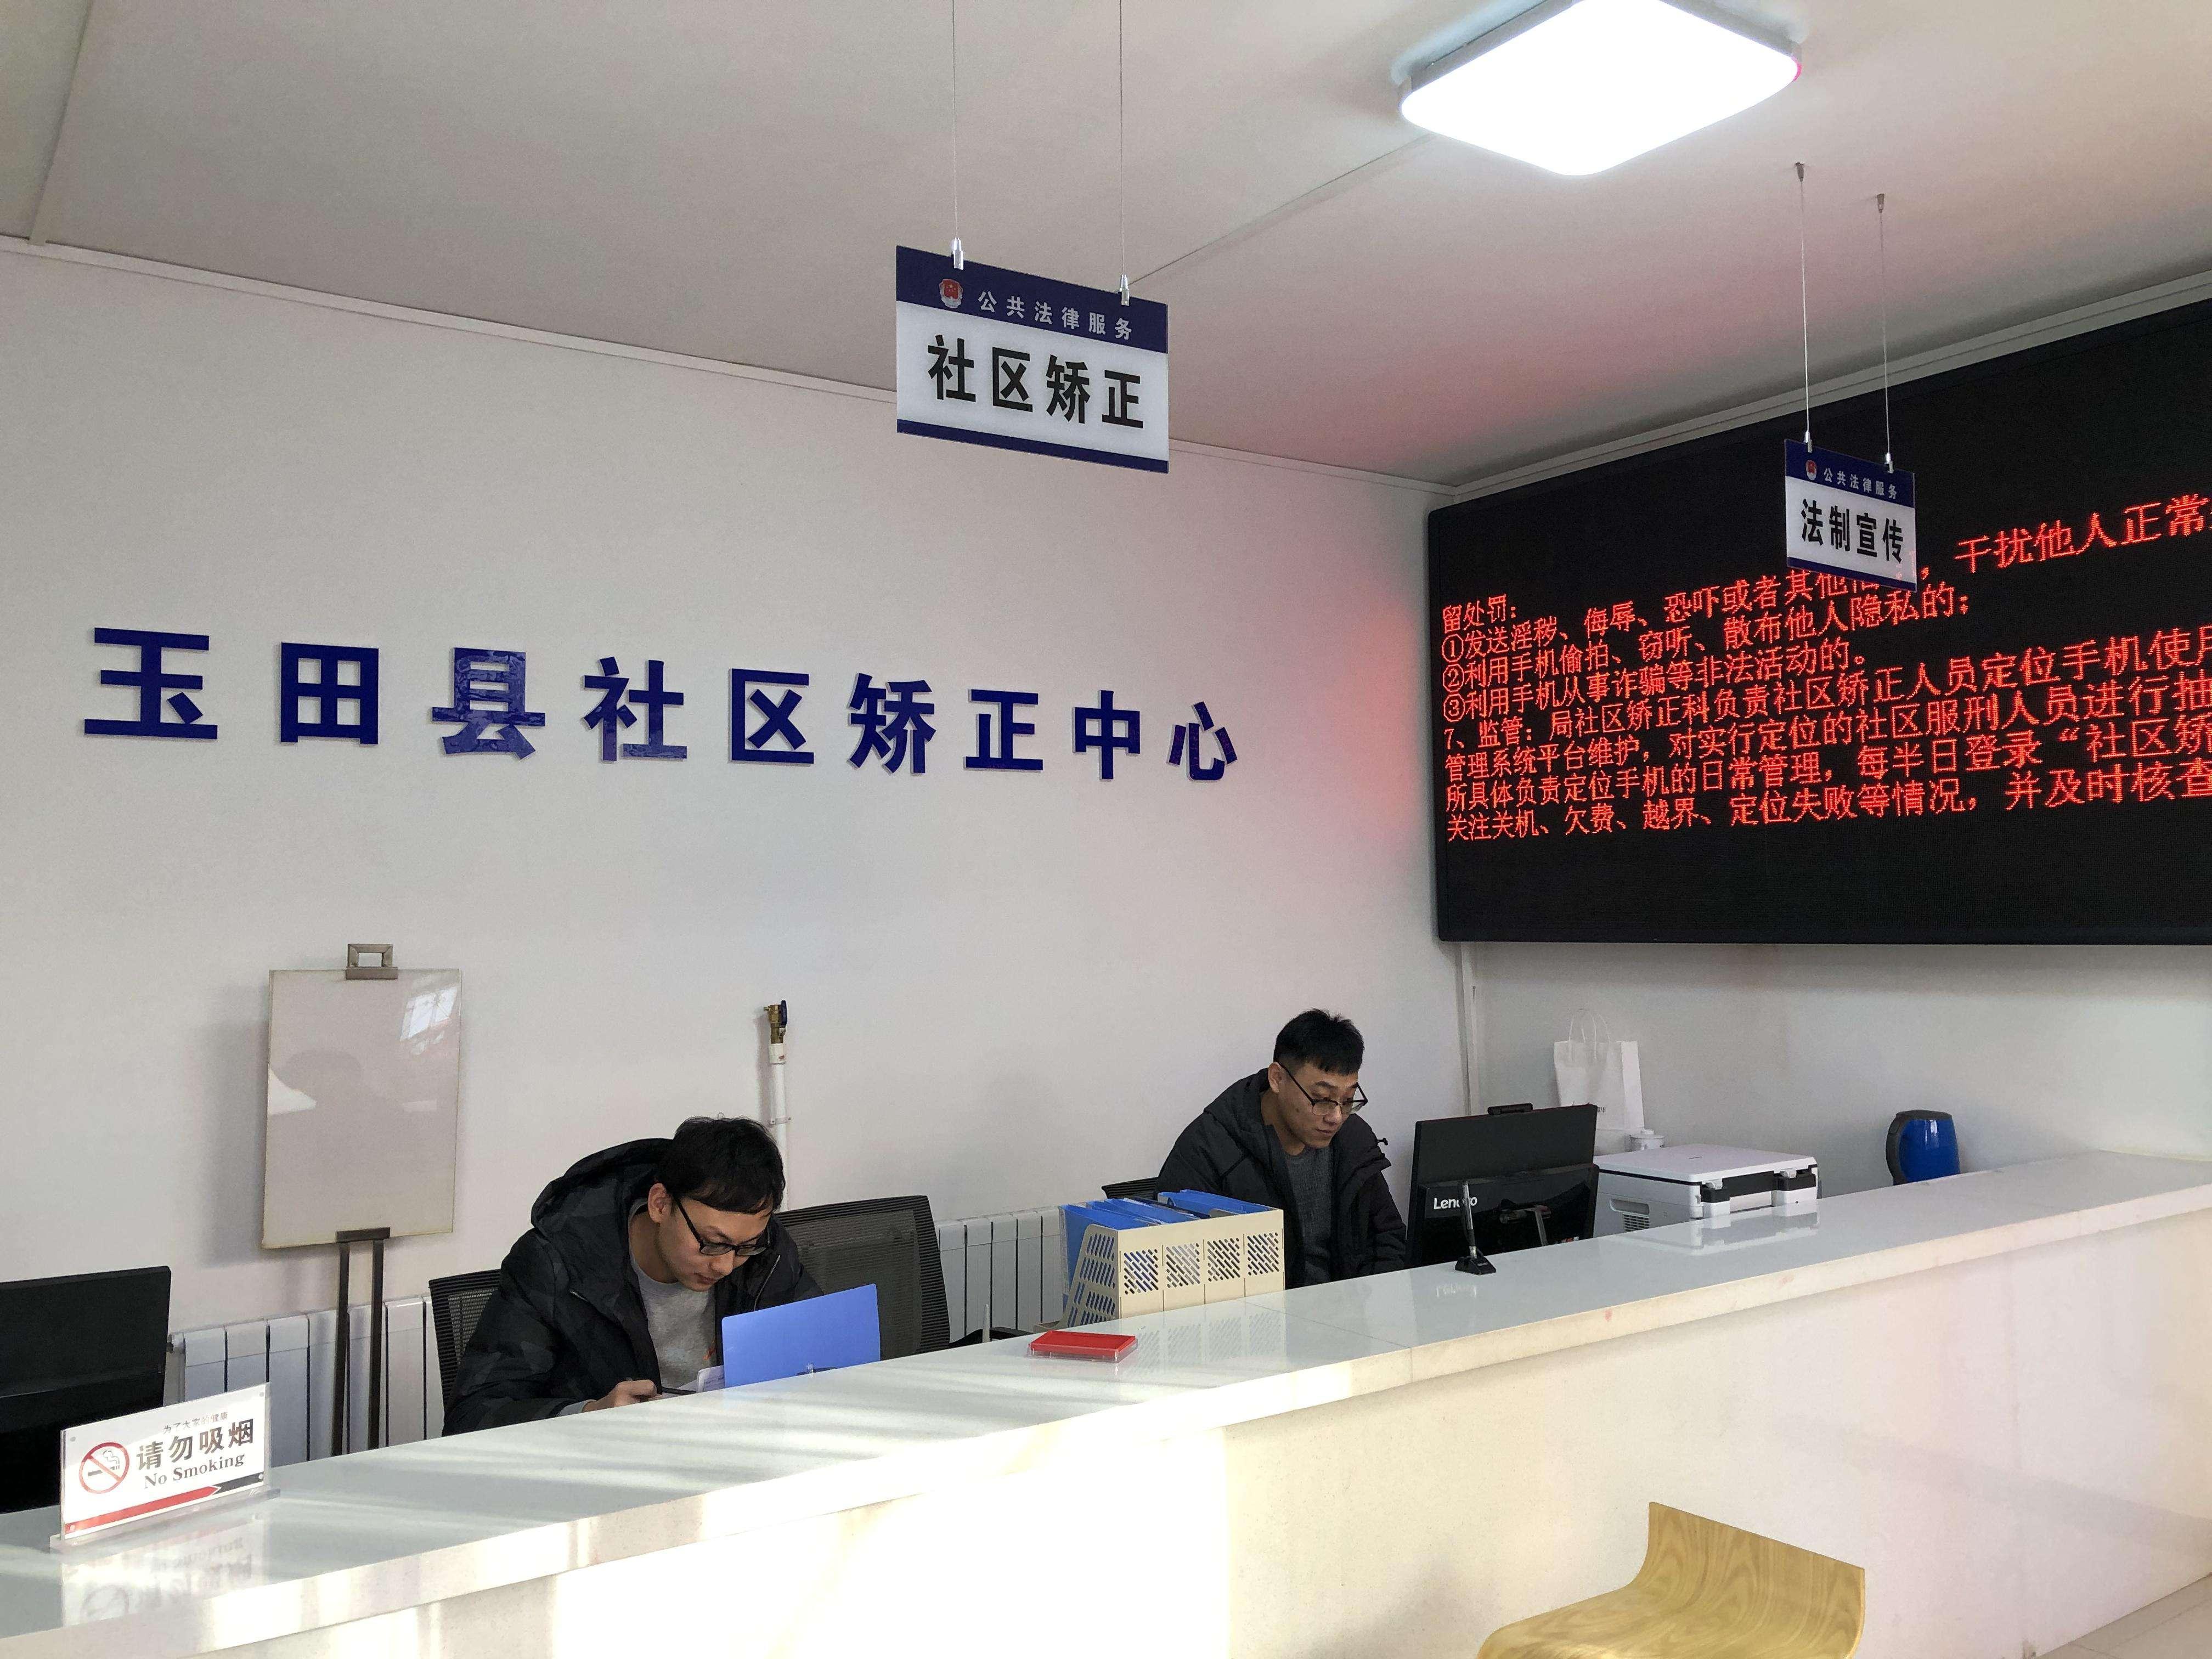 China passes community correction law